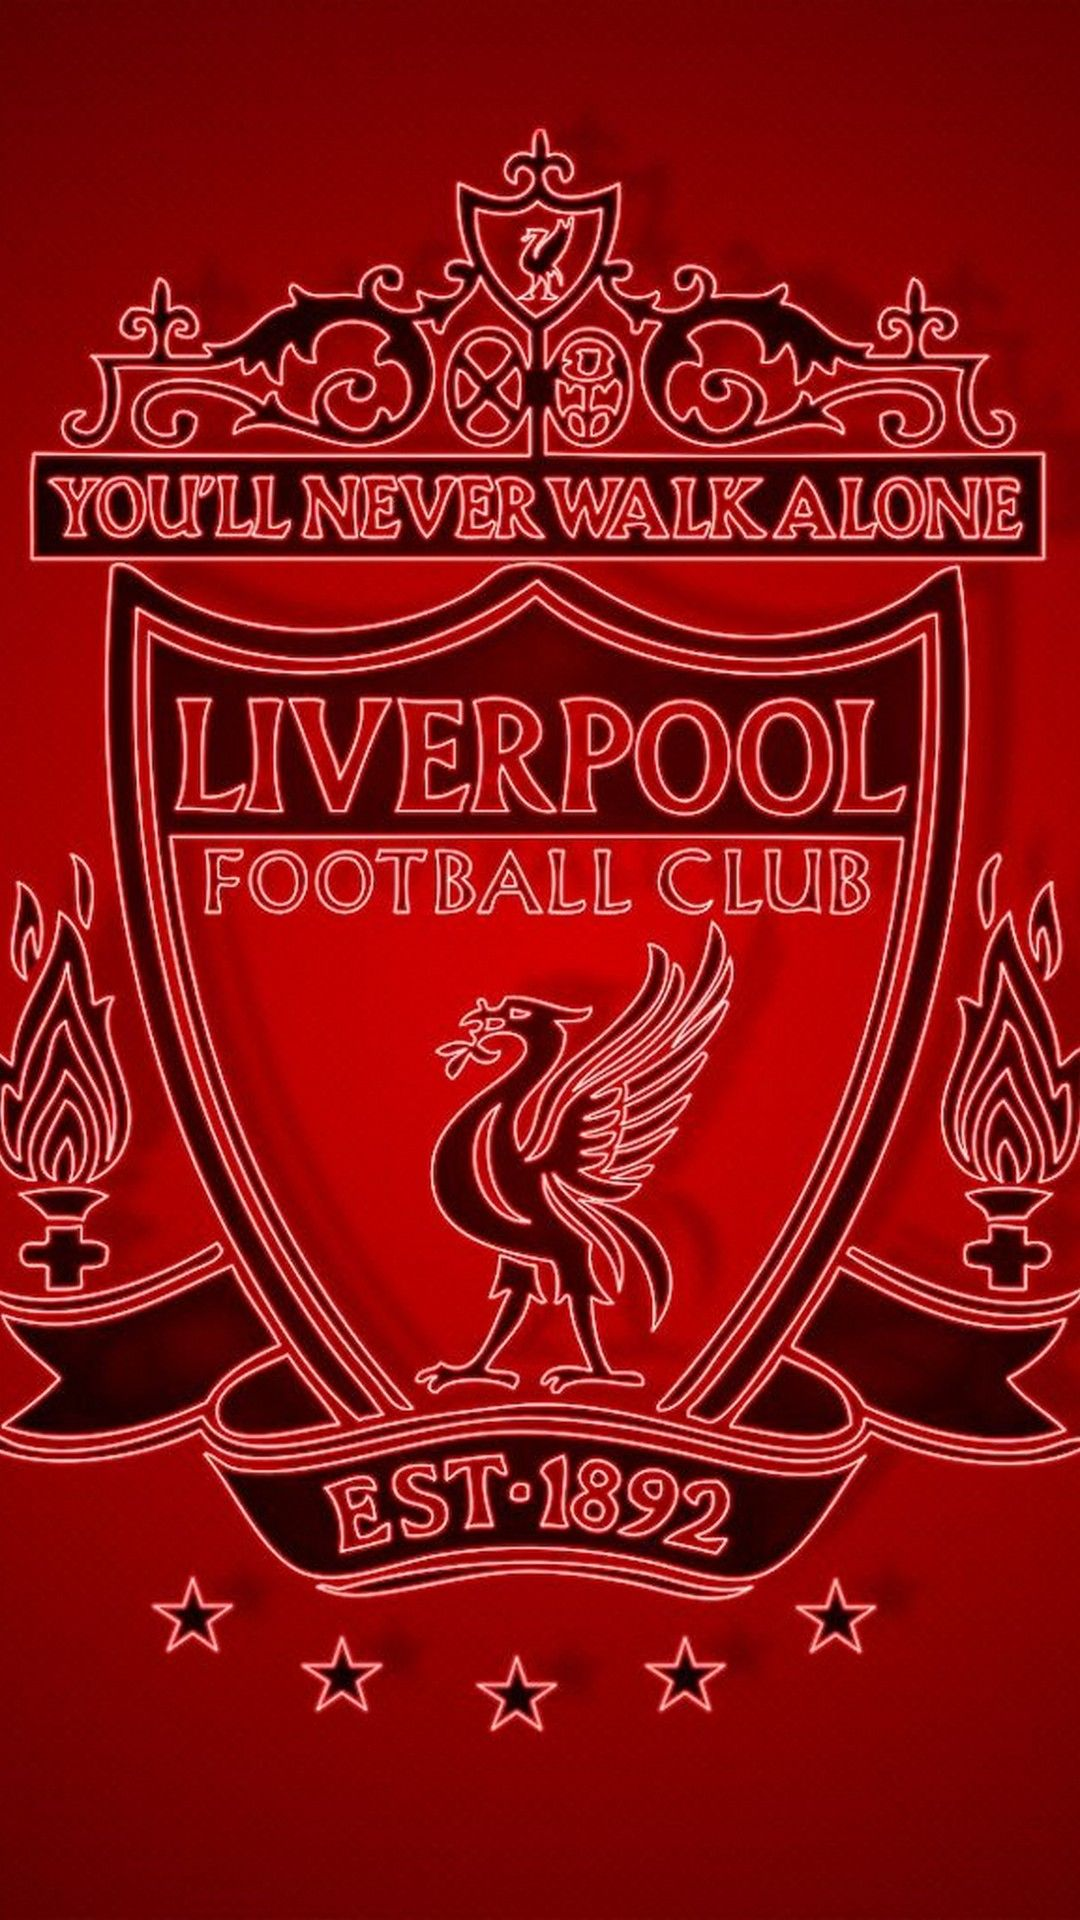 Iphone Wallpaper Hd Liverpool Best Football Wallpaper Hd Liverpool Wallpapers Football Wallpaper Iphone Wallpaper Liverpool